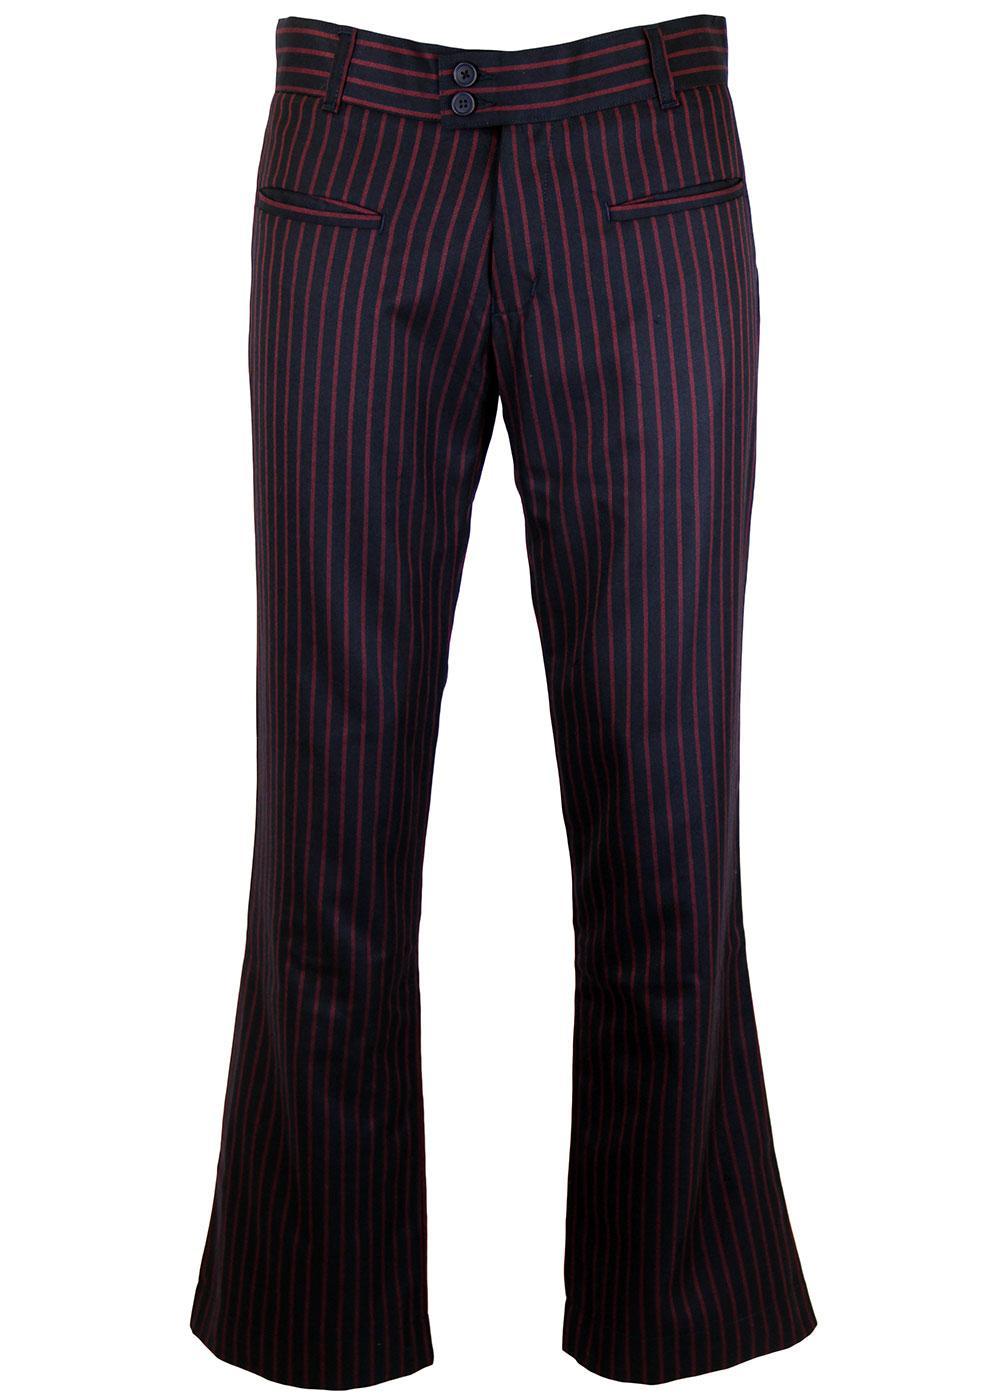 MADCAP ENGLAND Goldhawk Retro Kick Flare Trousers